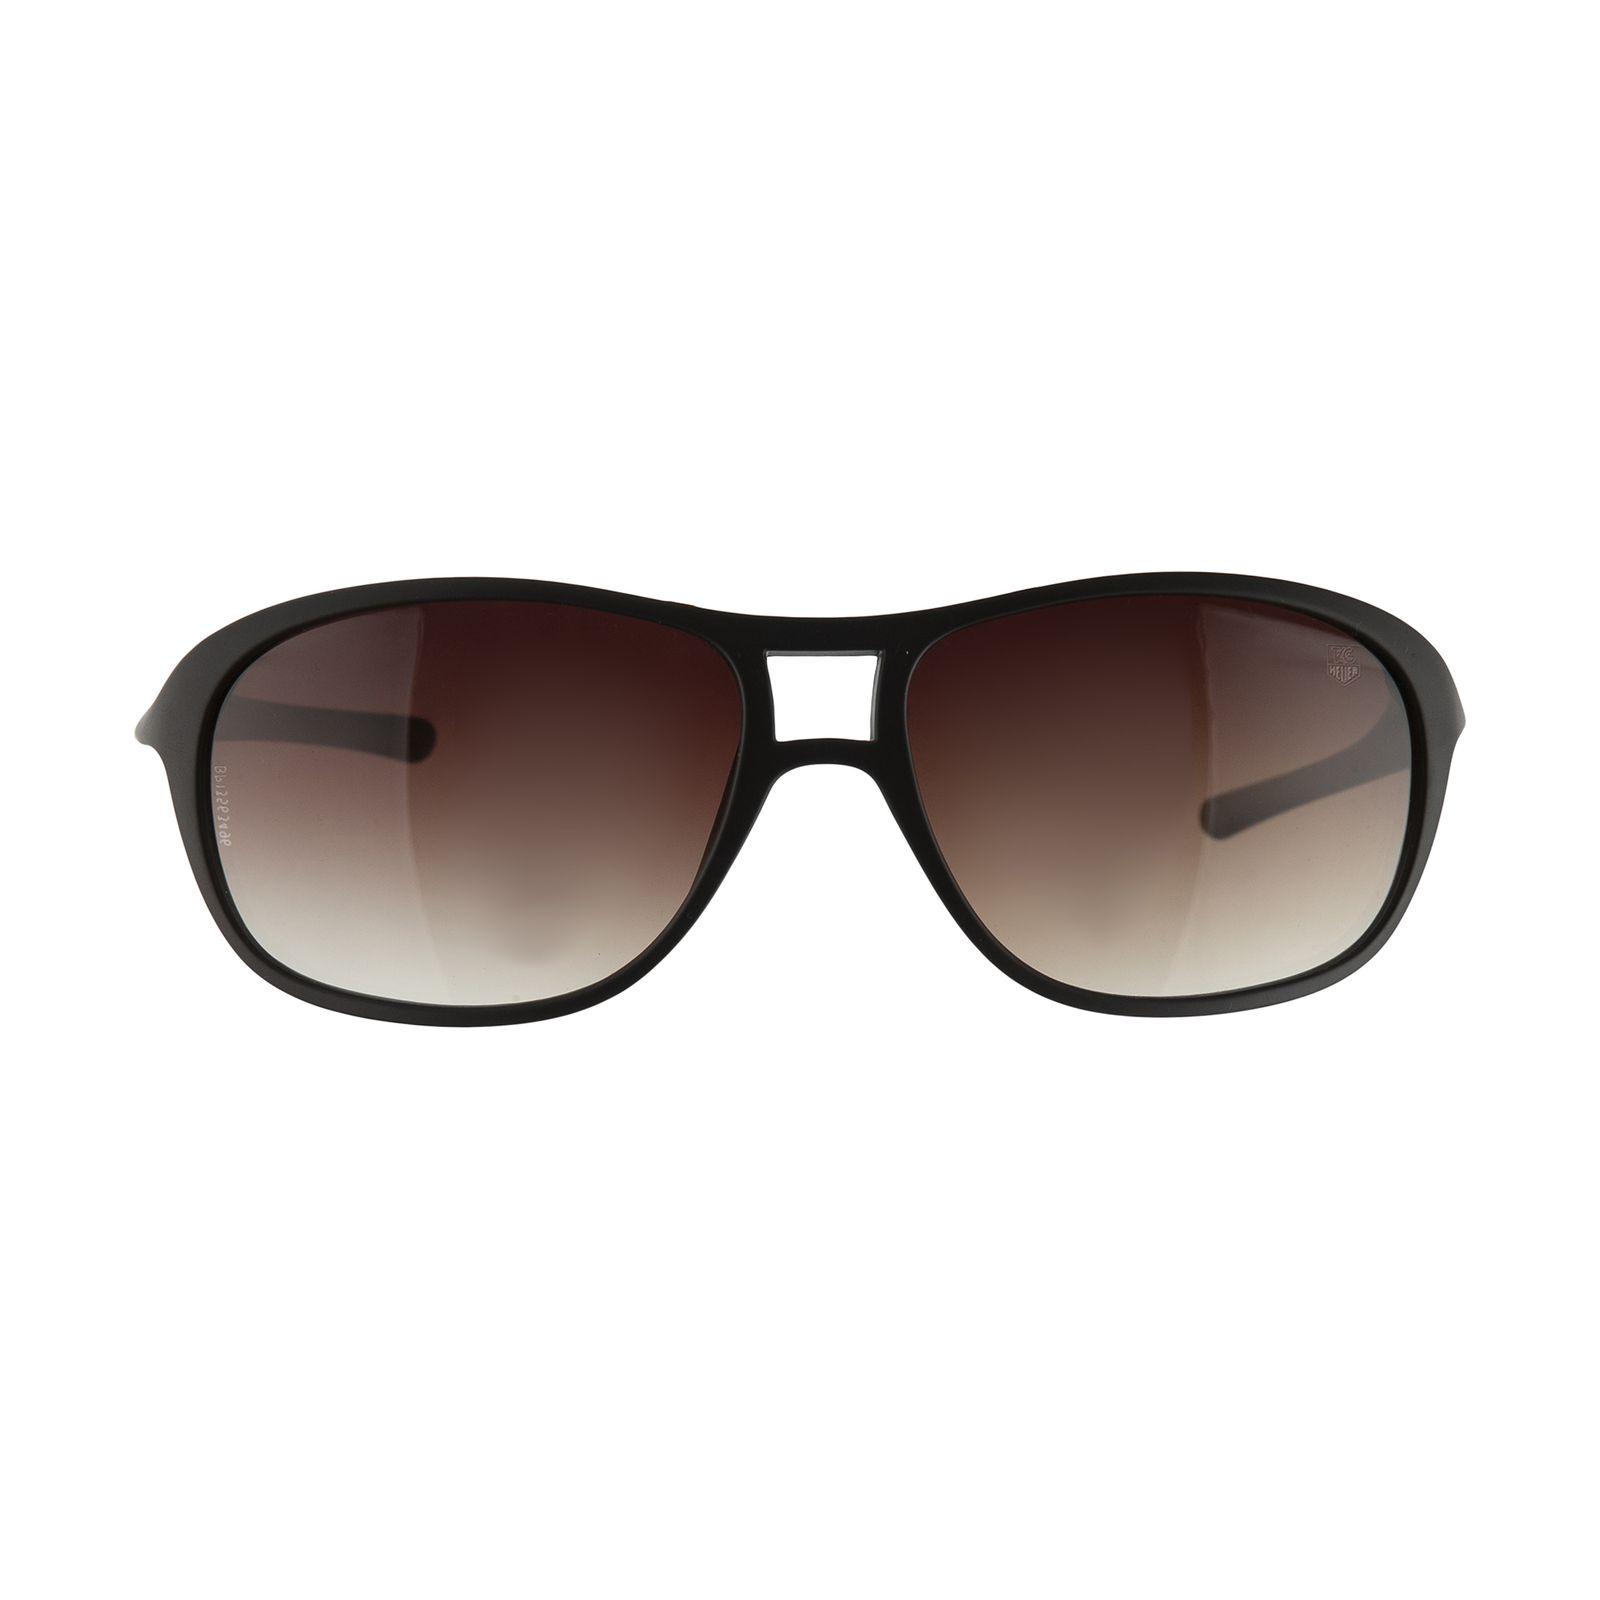 عینک آفتابی تگ هویر مدل 6043 -  - 2